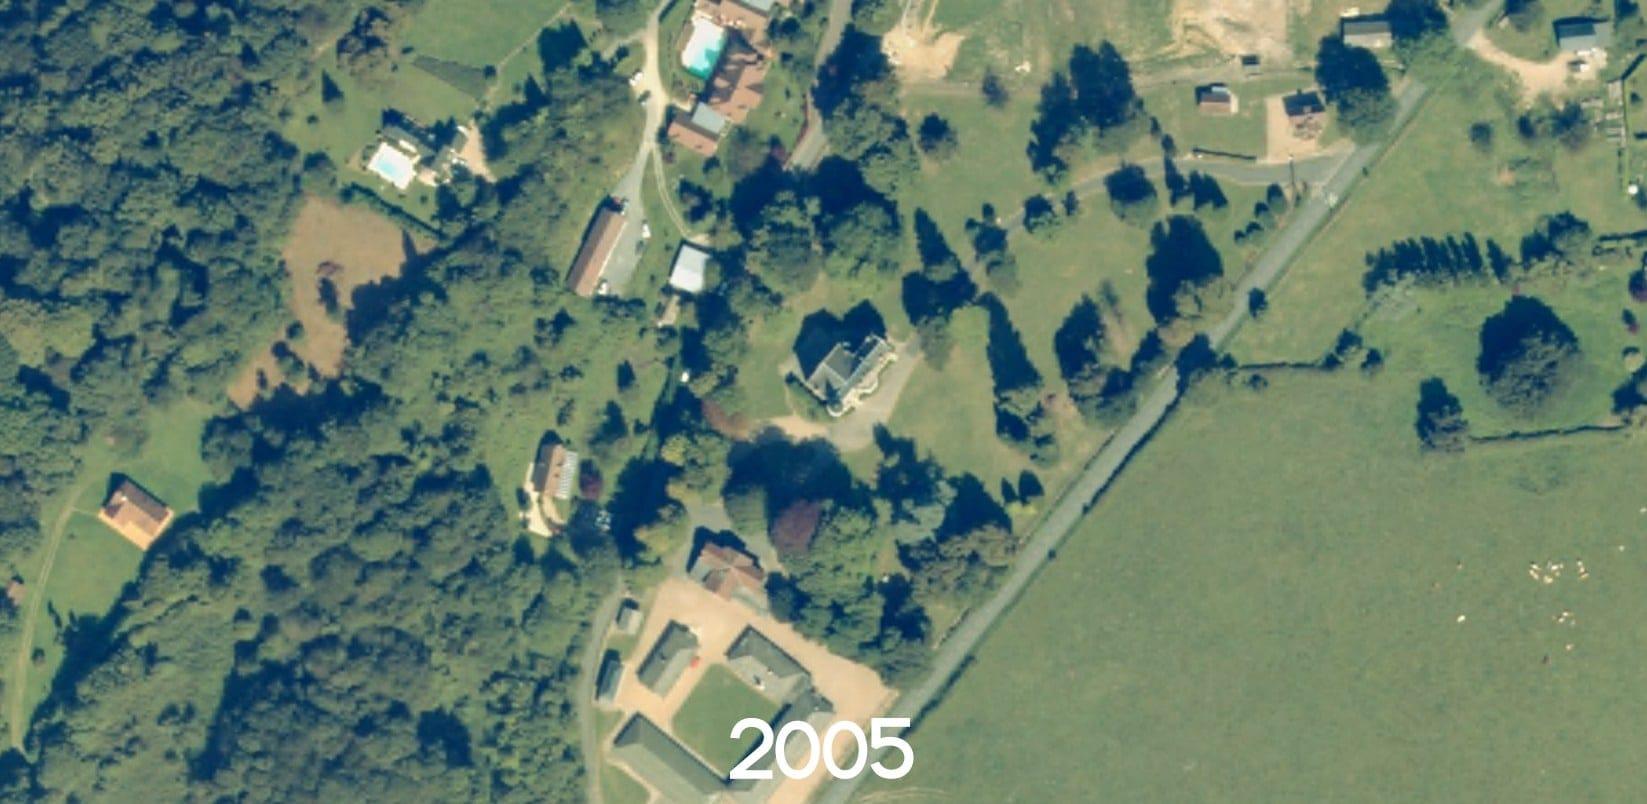 chateau-eva-coo-before-map2005